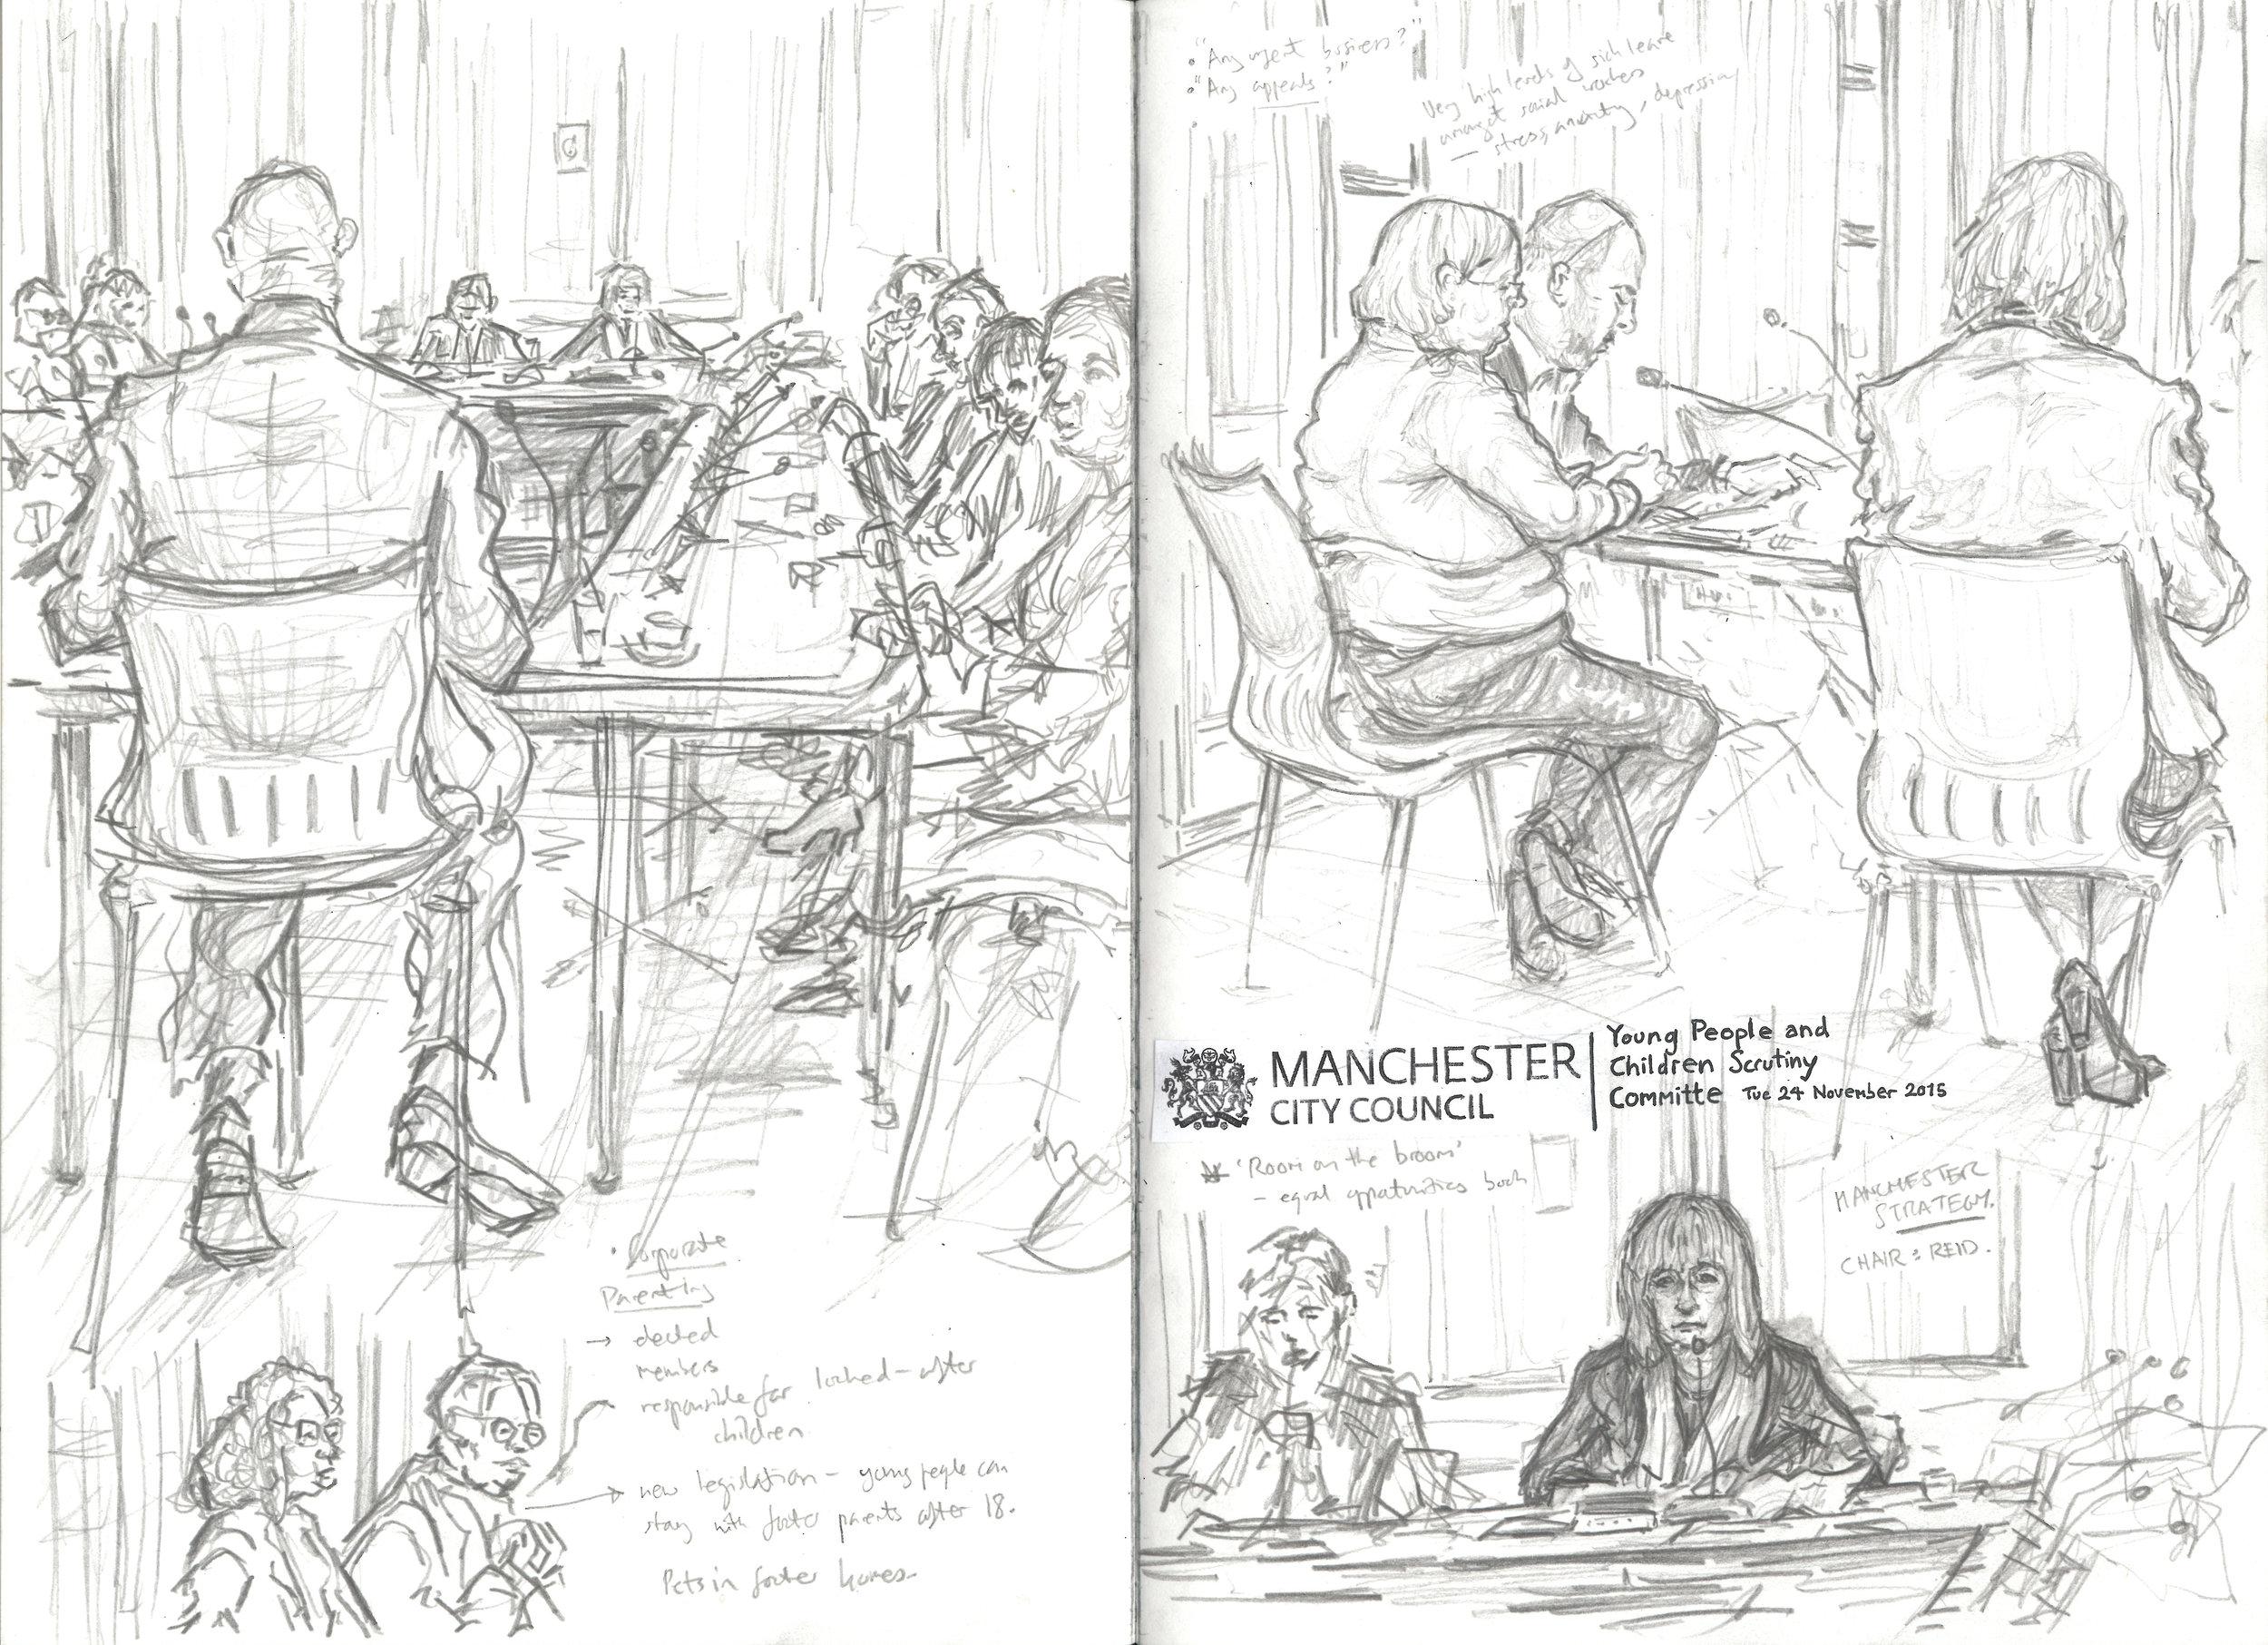 Robin Sukatorn_Manchester City Council Commitee Meeting_2015.jpg